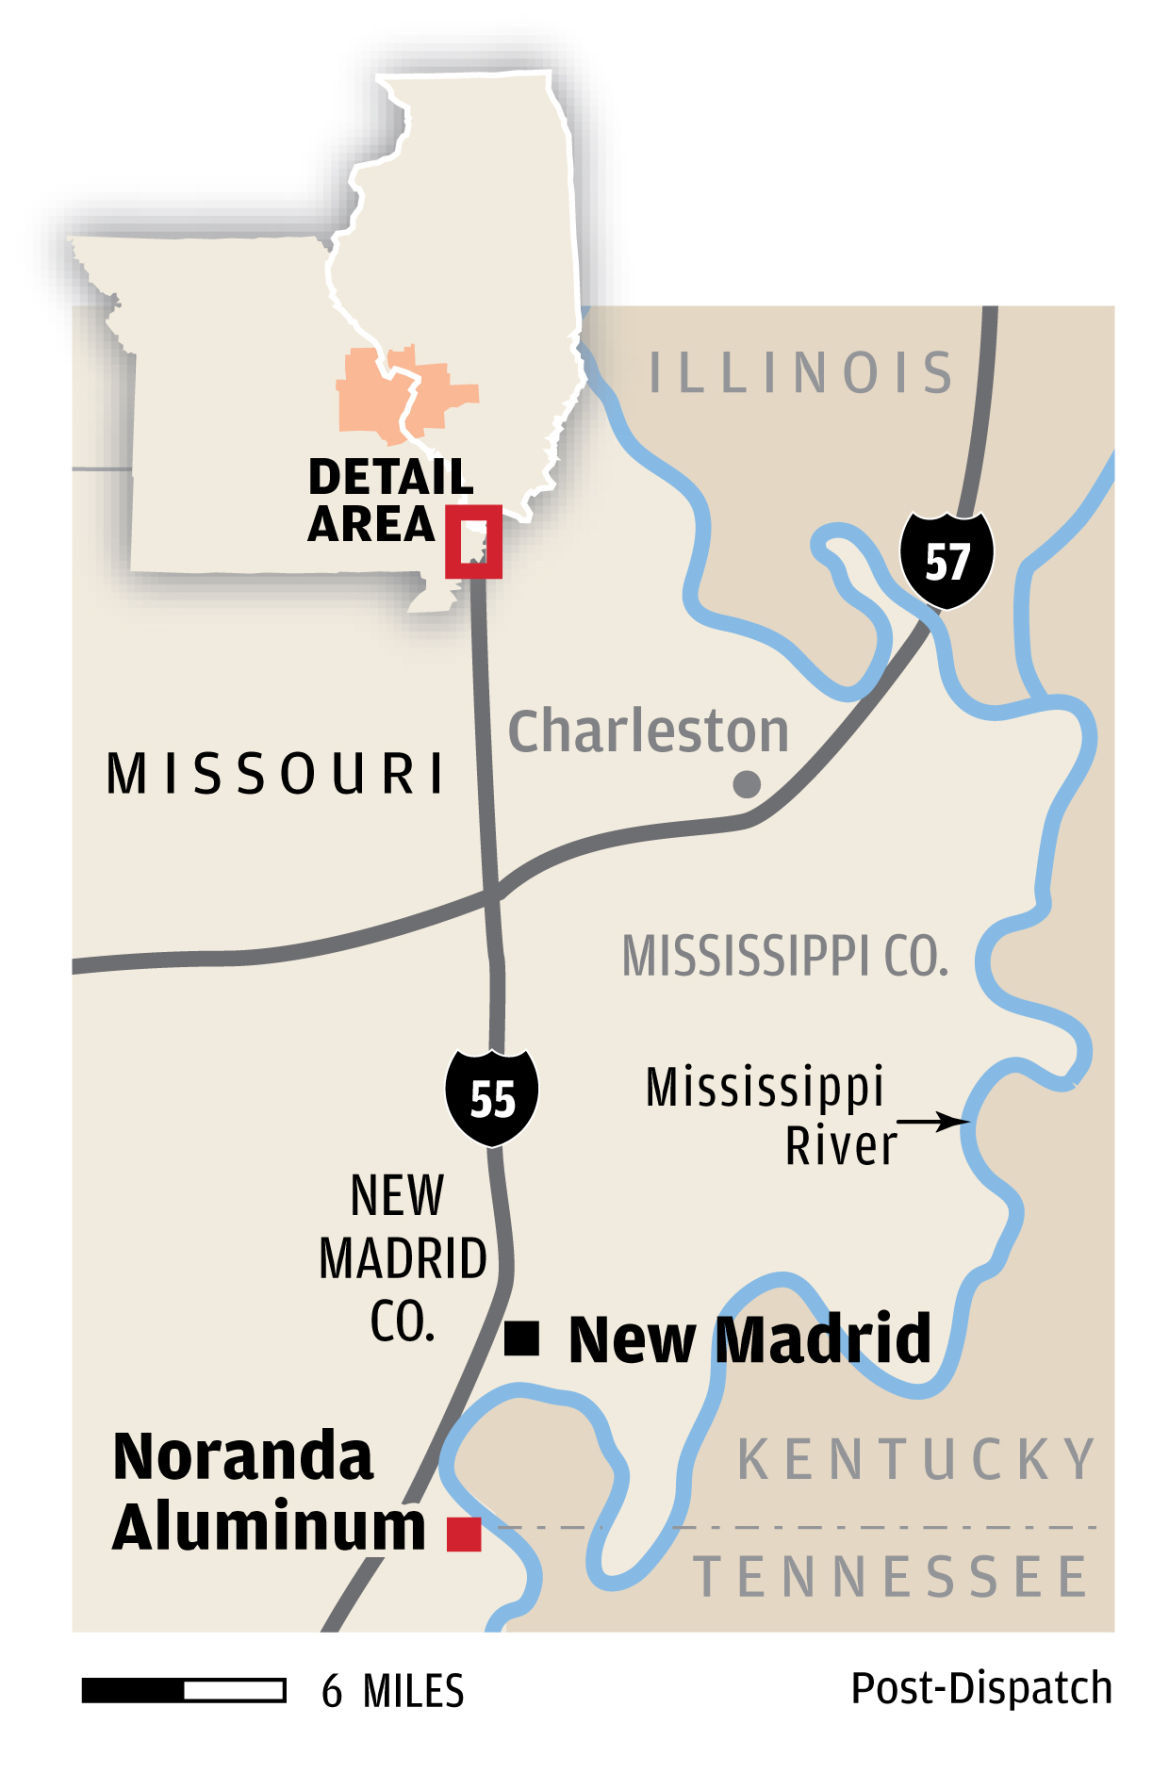 Noranda Aluminum closure marks the end of an era in the Missouri